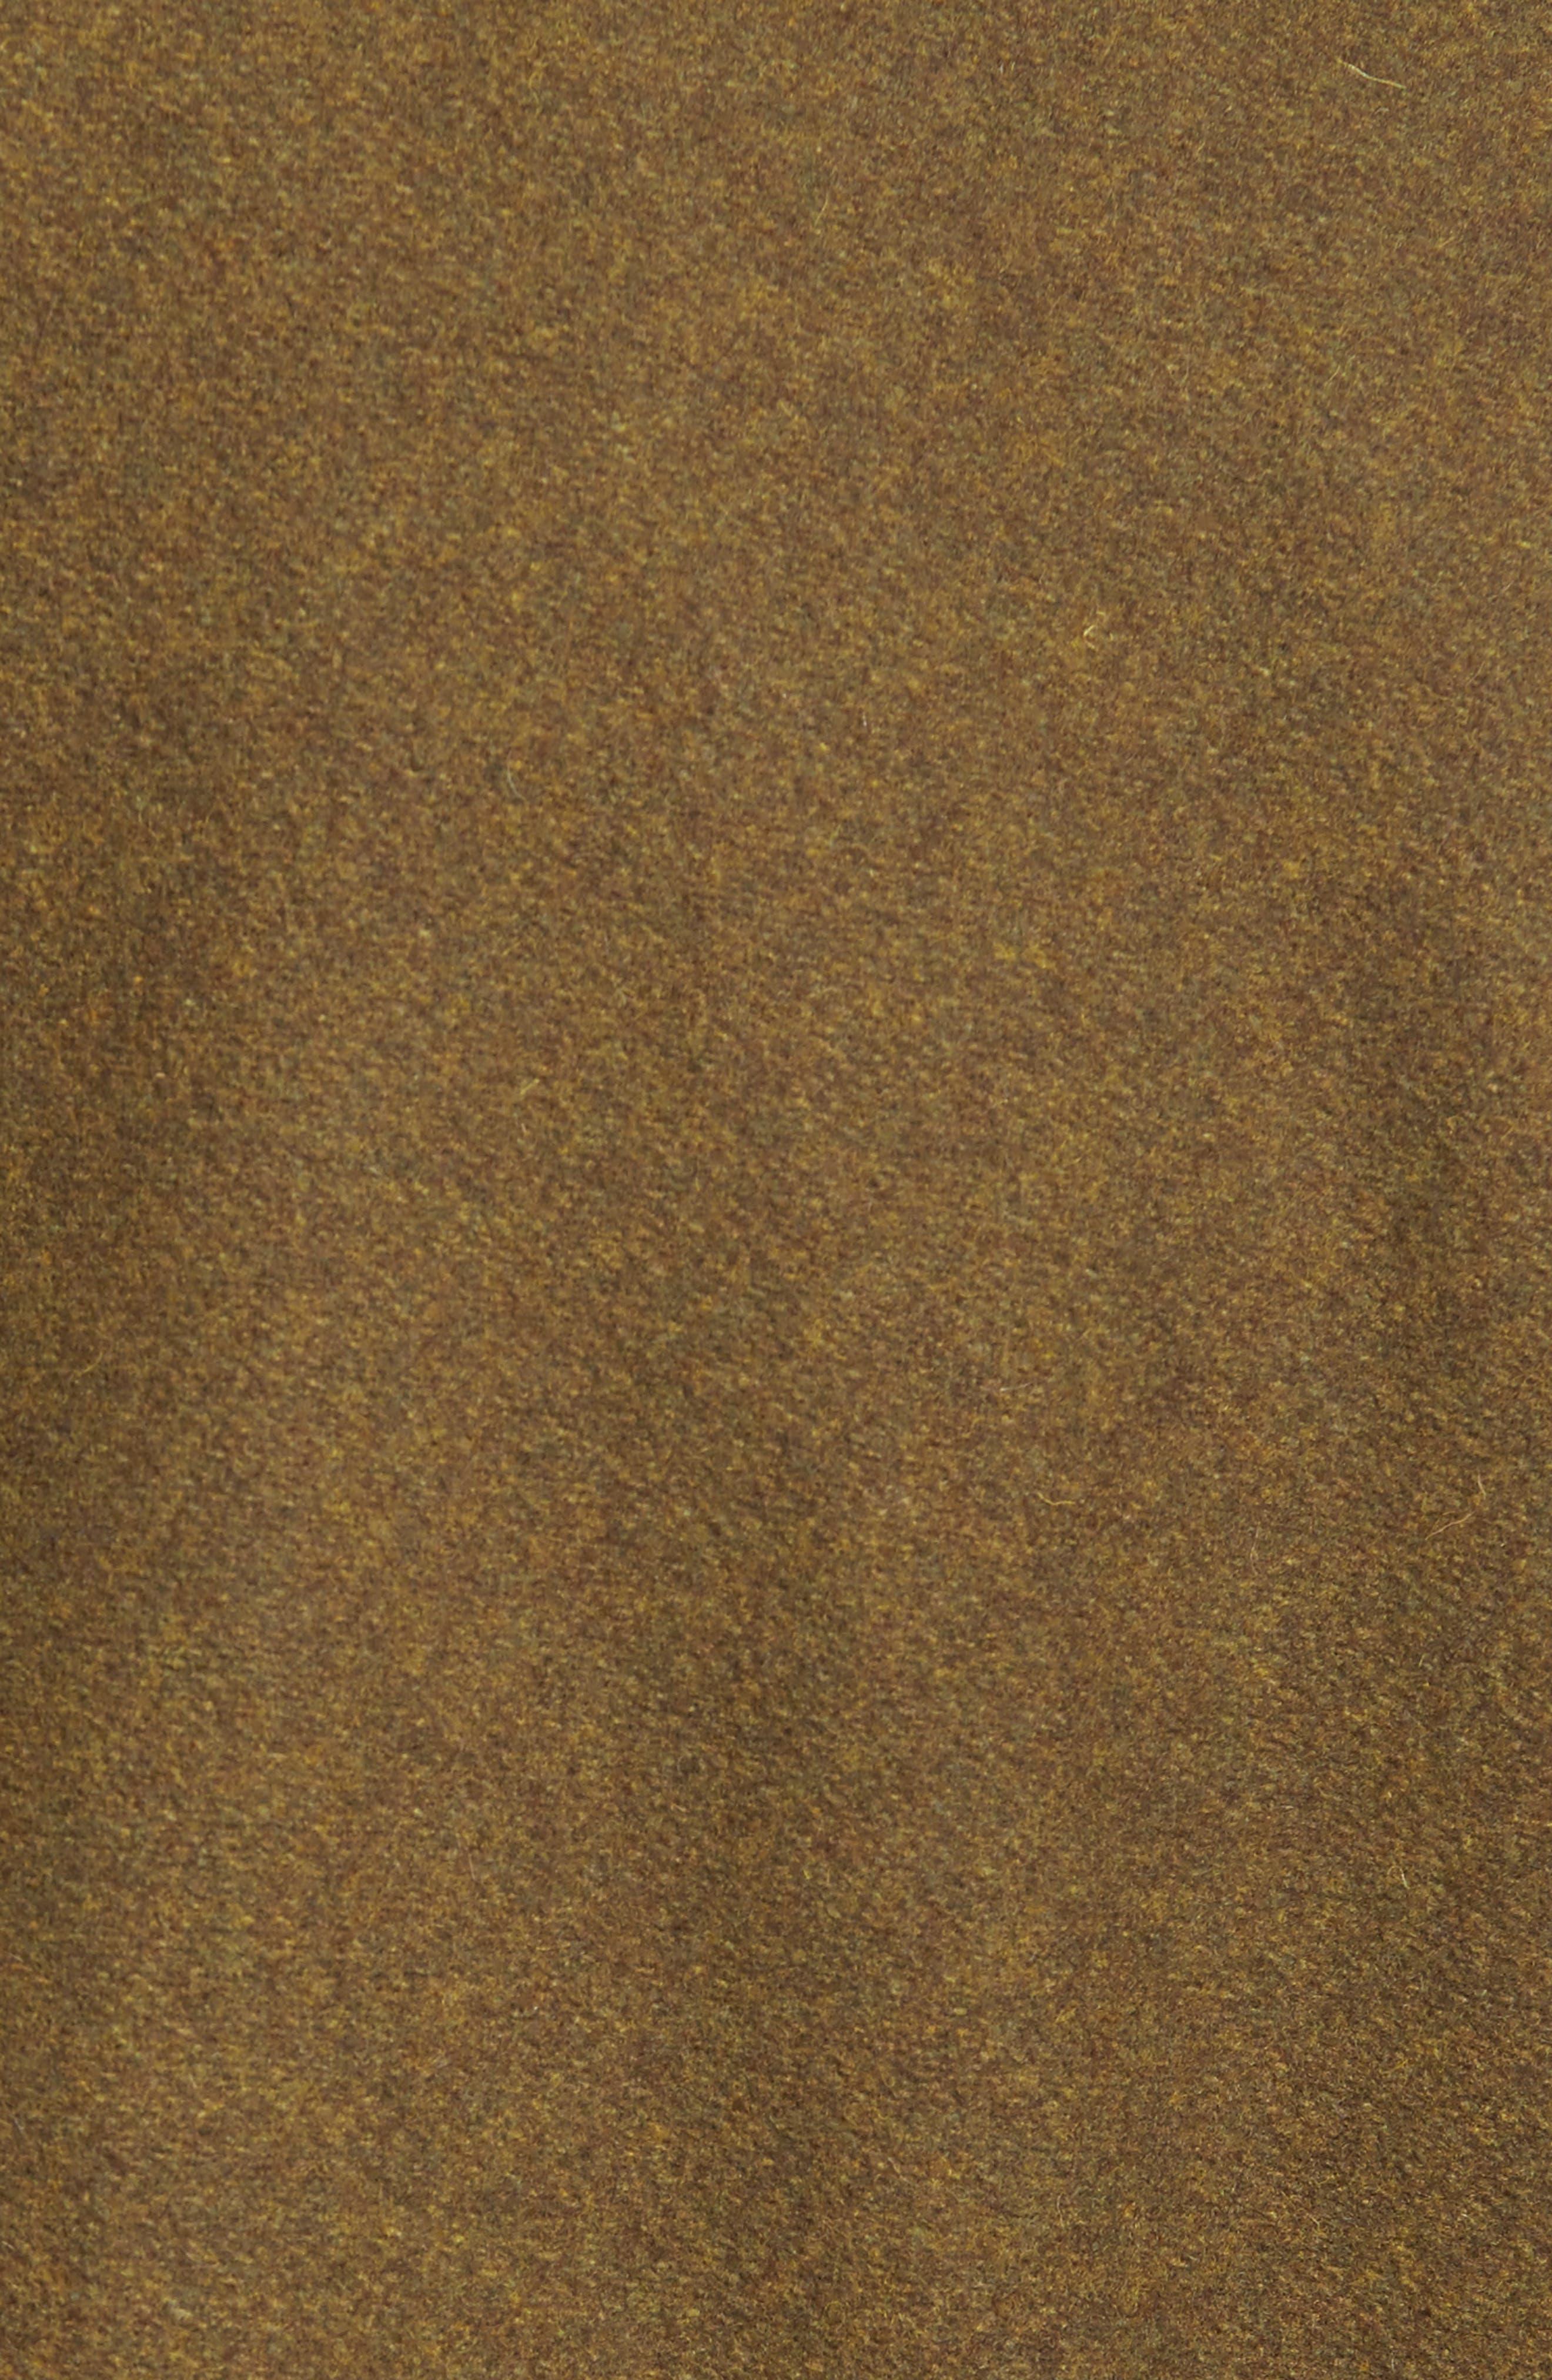 Embellished Slim Wool Blend Peacoat,                             Alternate thumbnail 17, color,